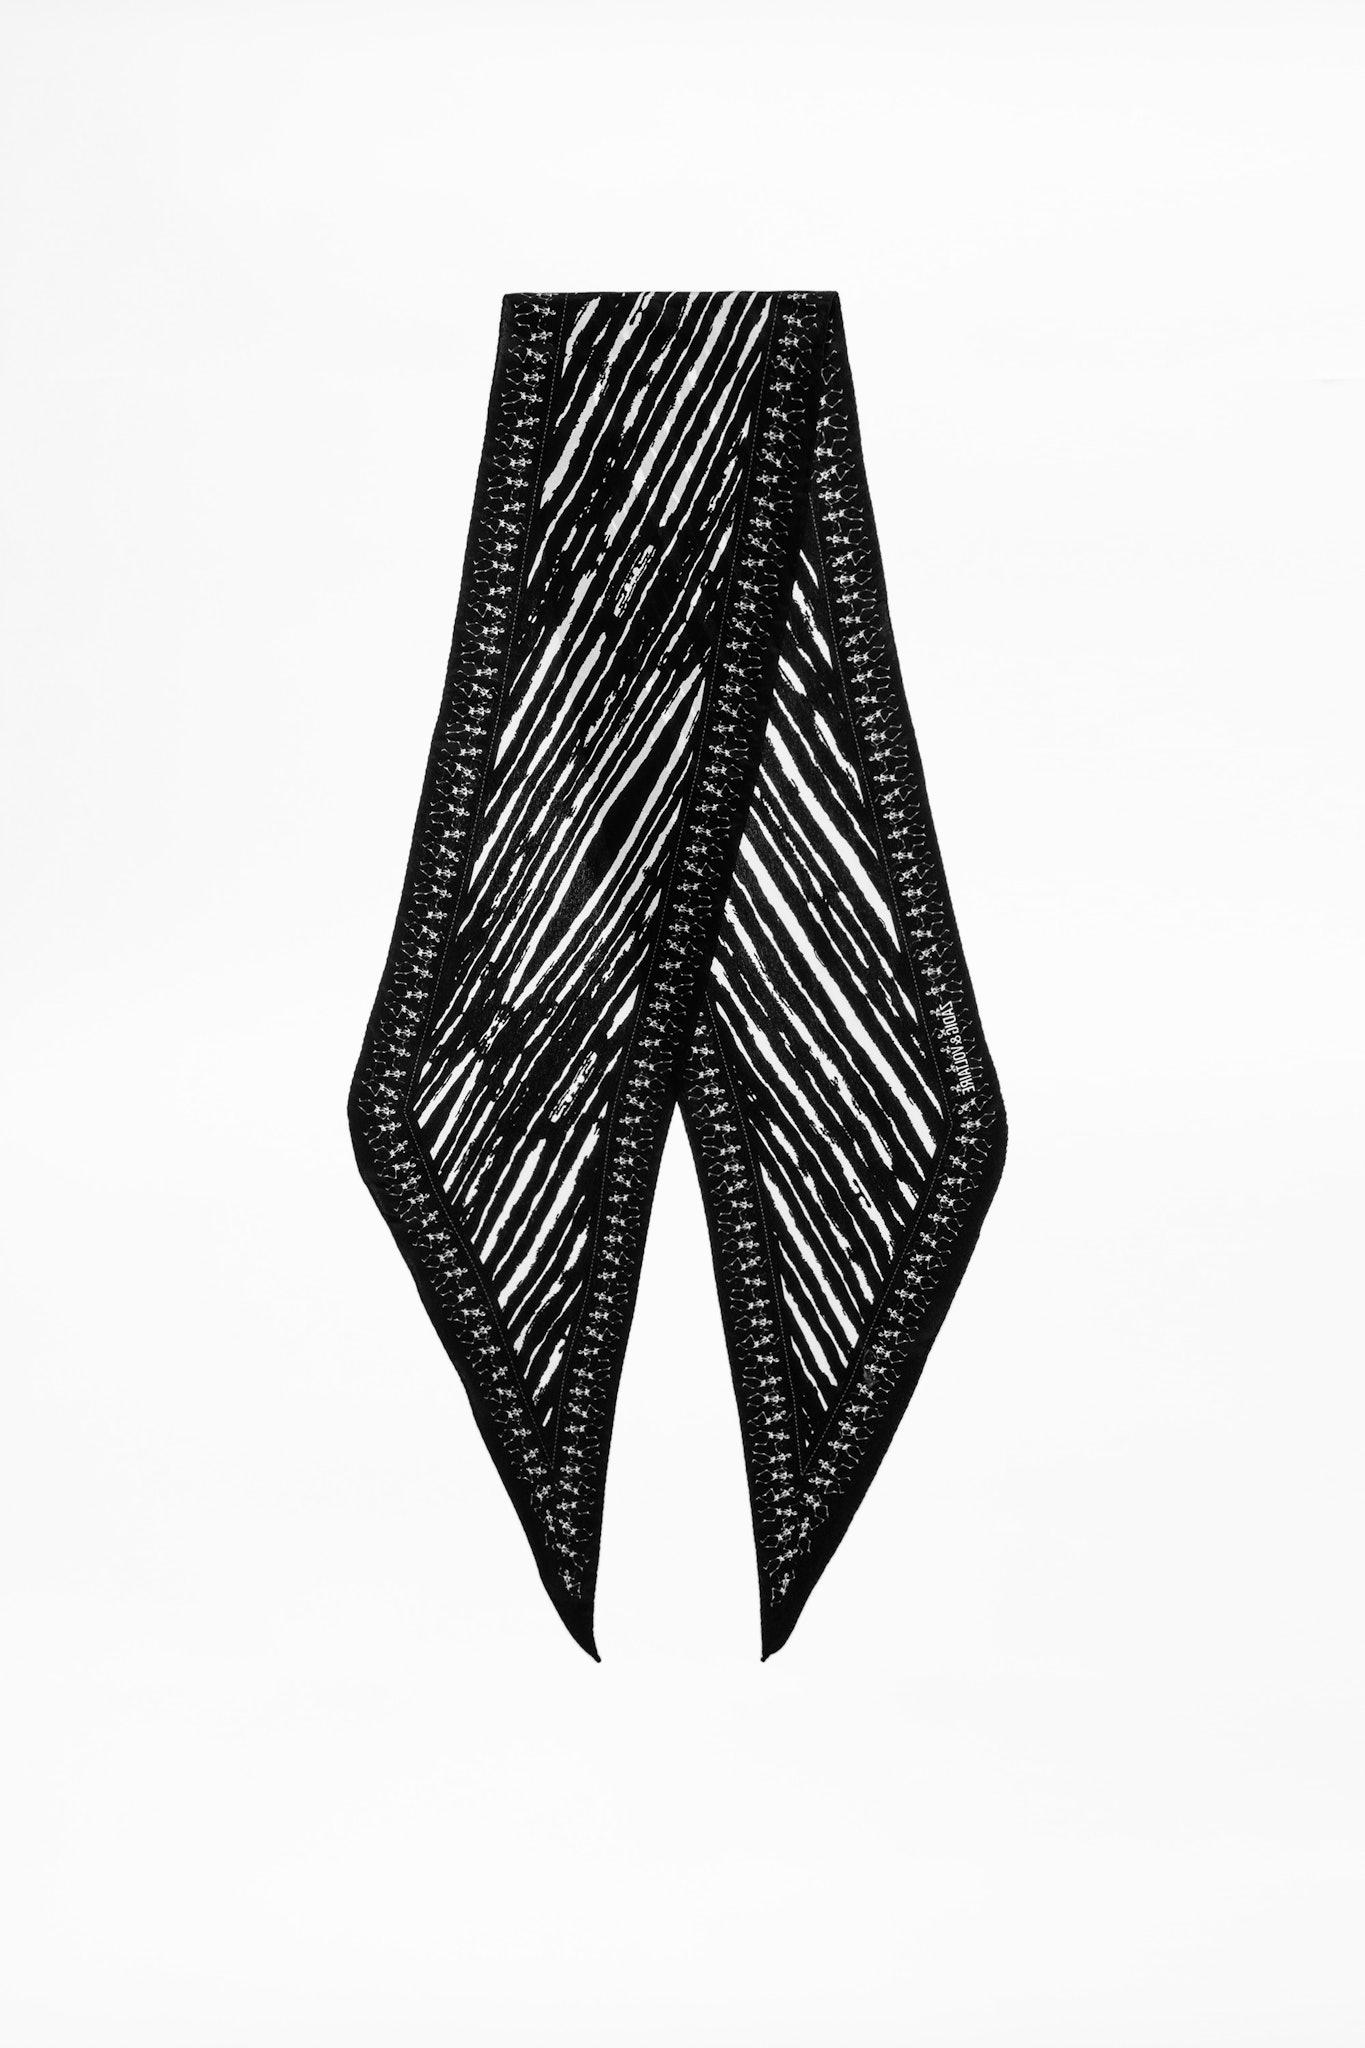 Foulard Silky Skeletons